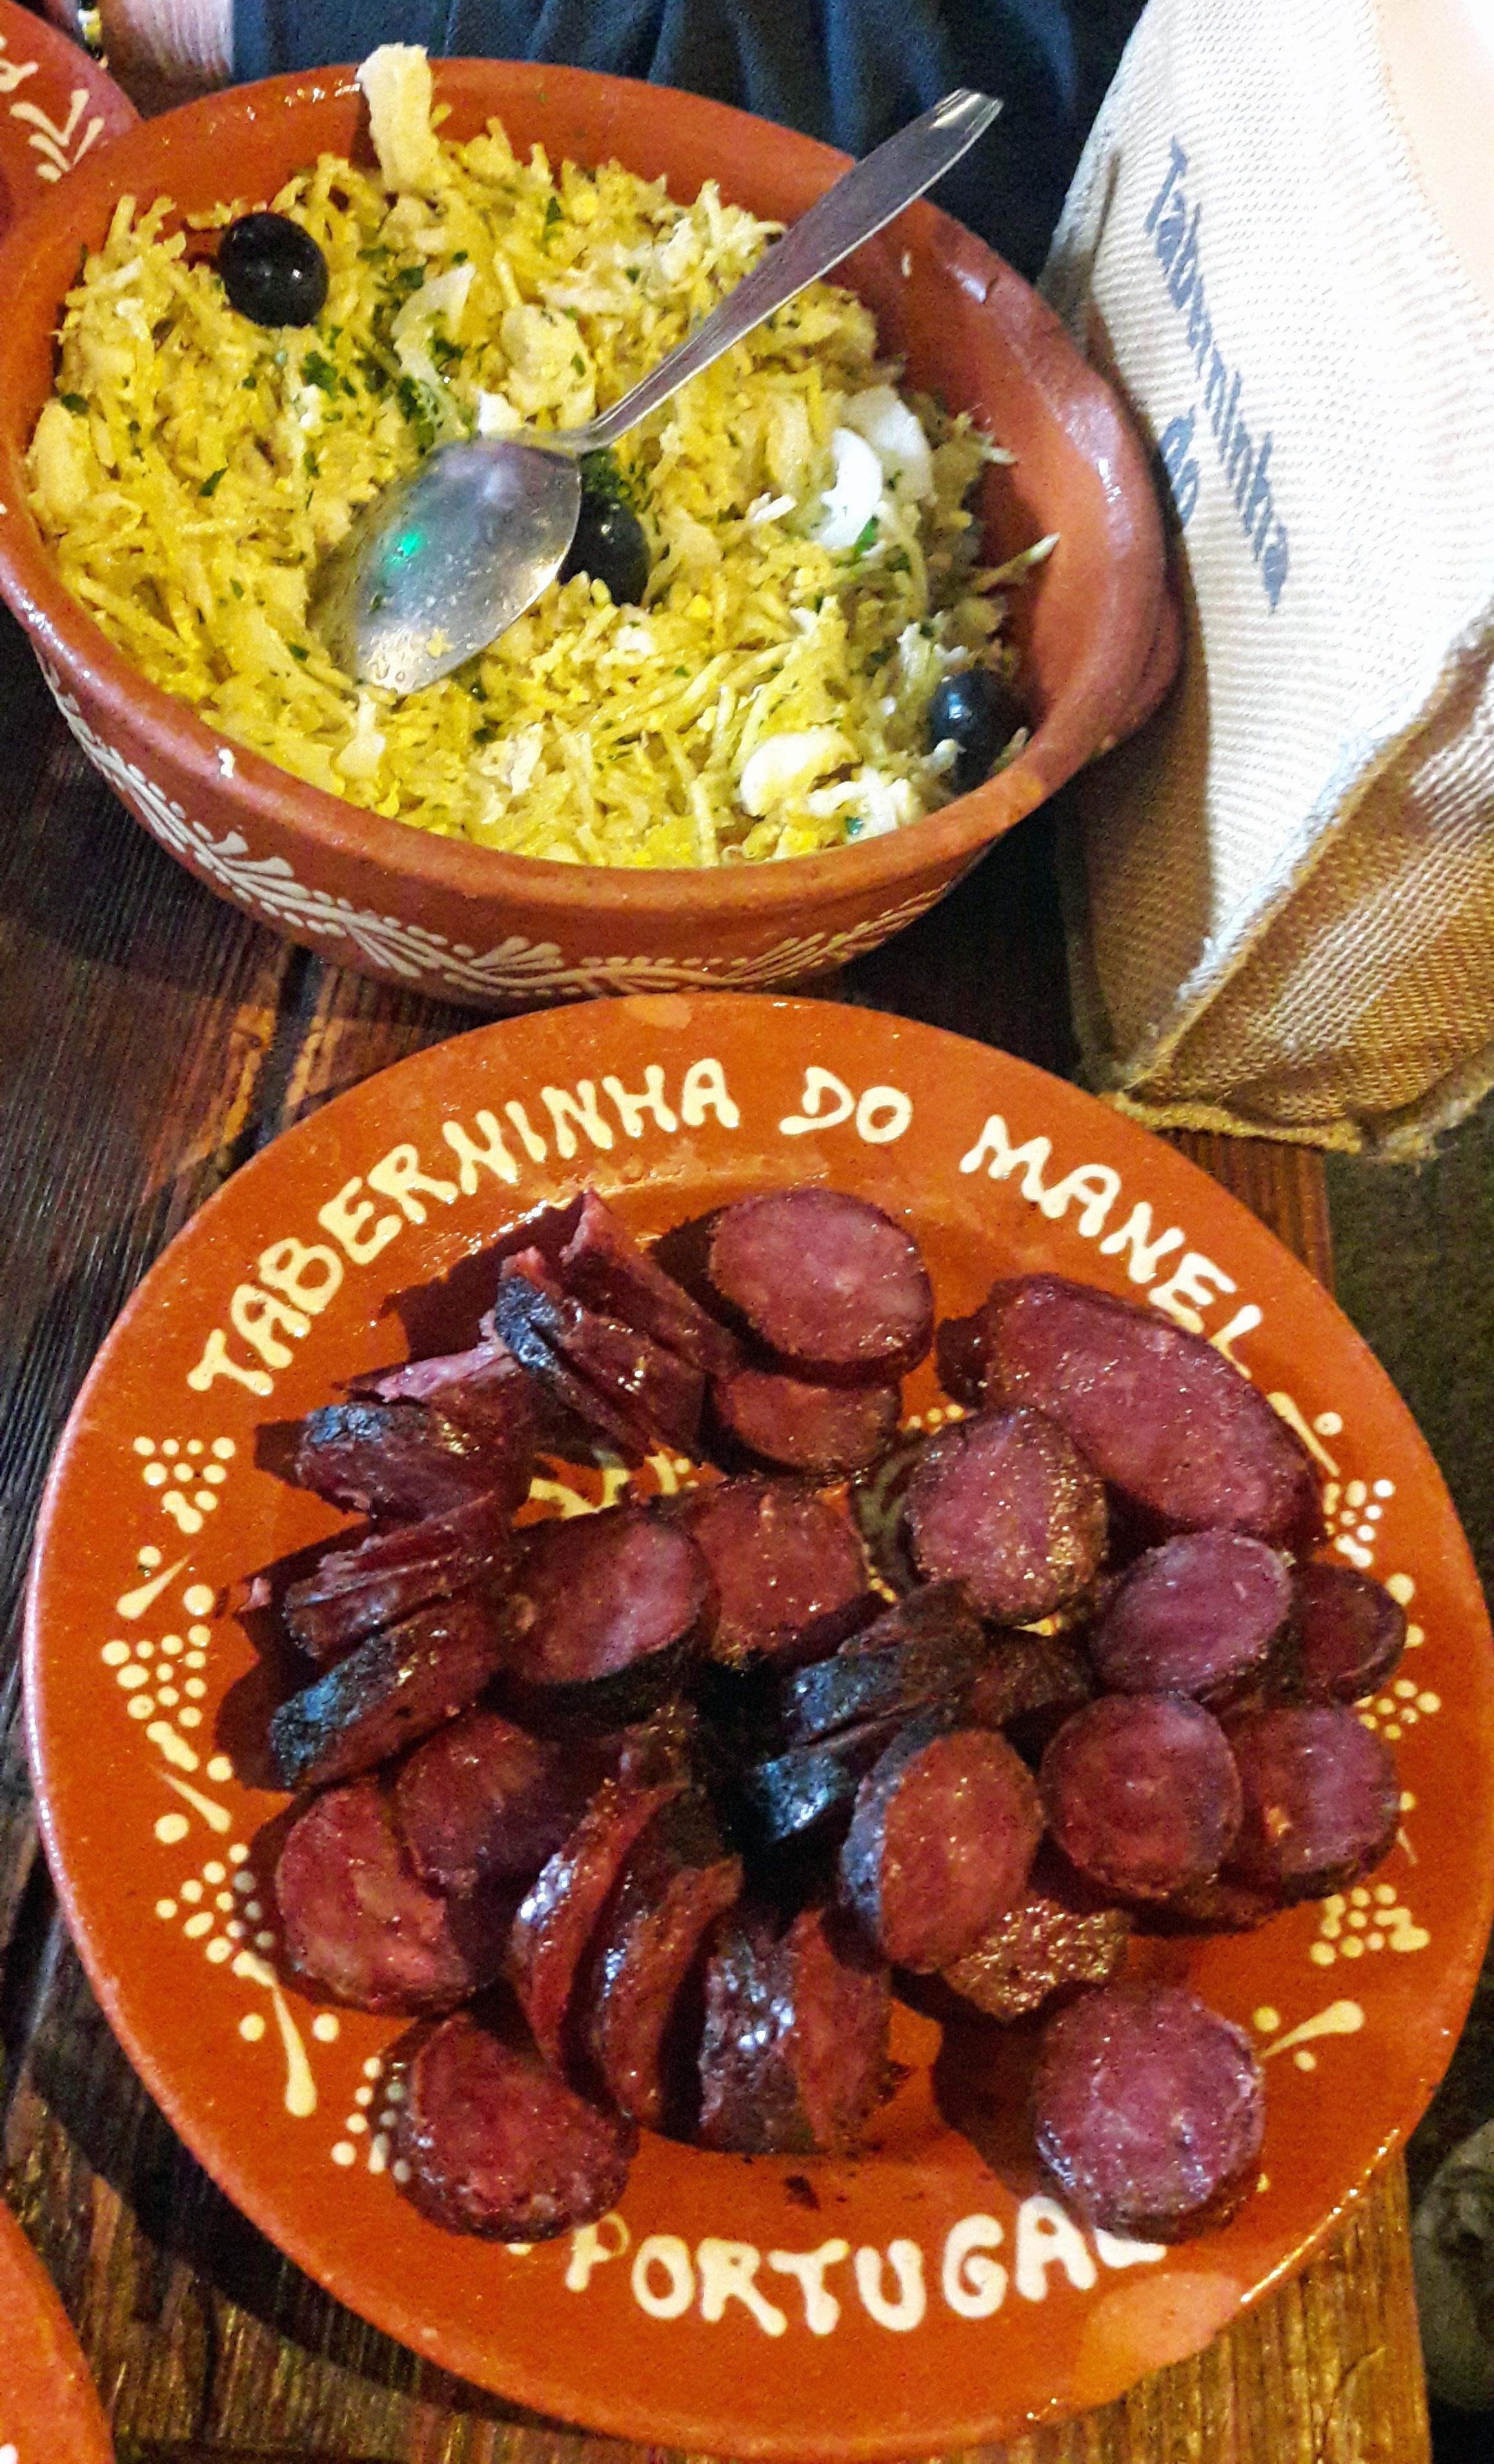 Restaurante Taberninha do Manel Bacalao según Bras y chorizo ahumado asado